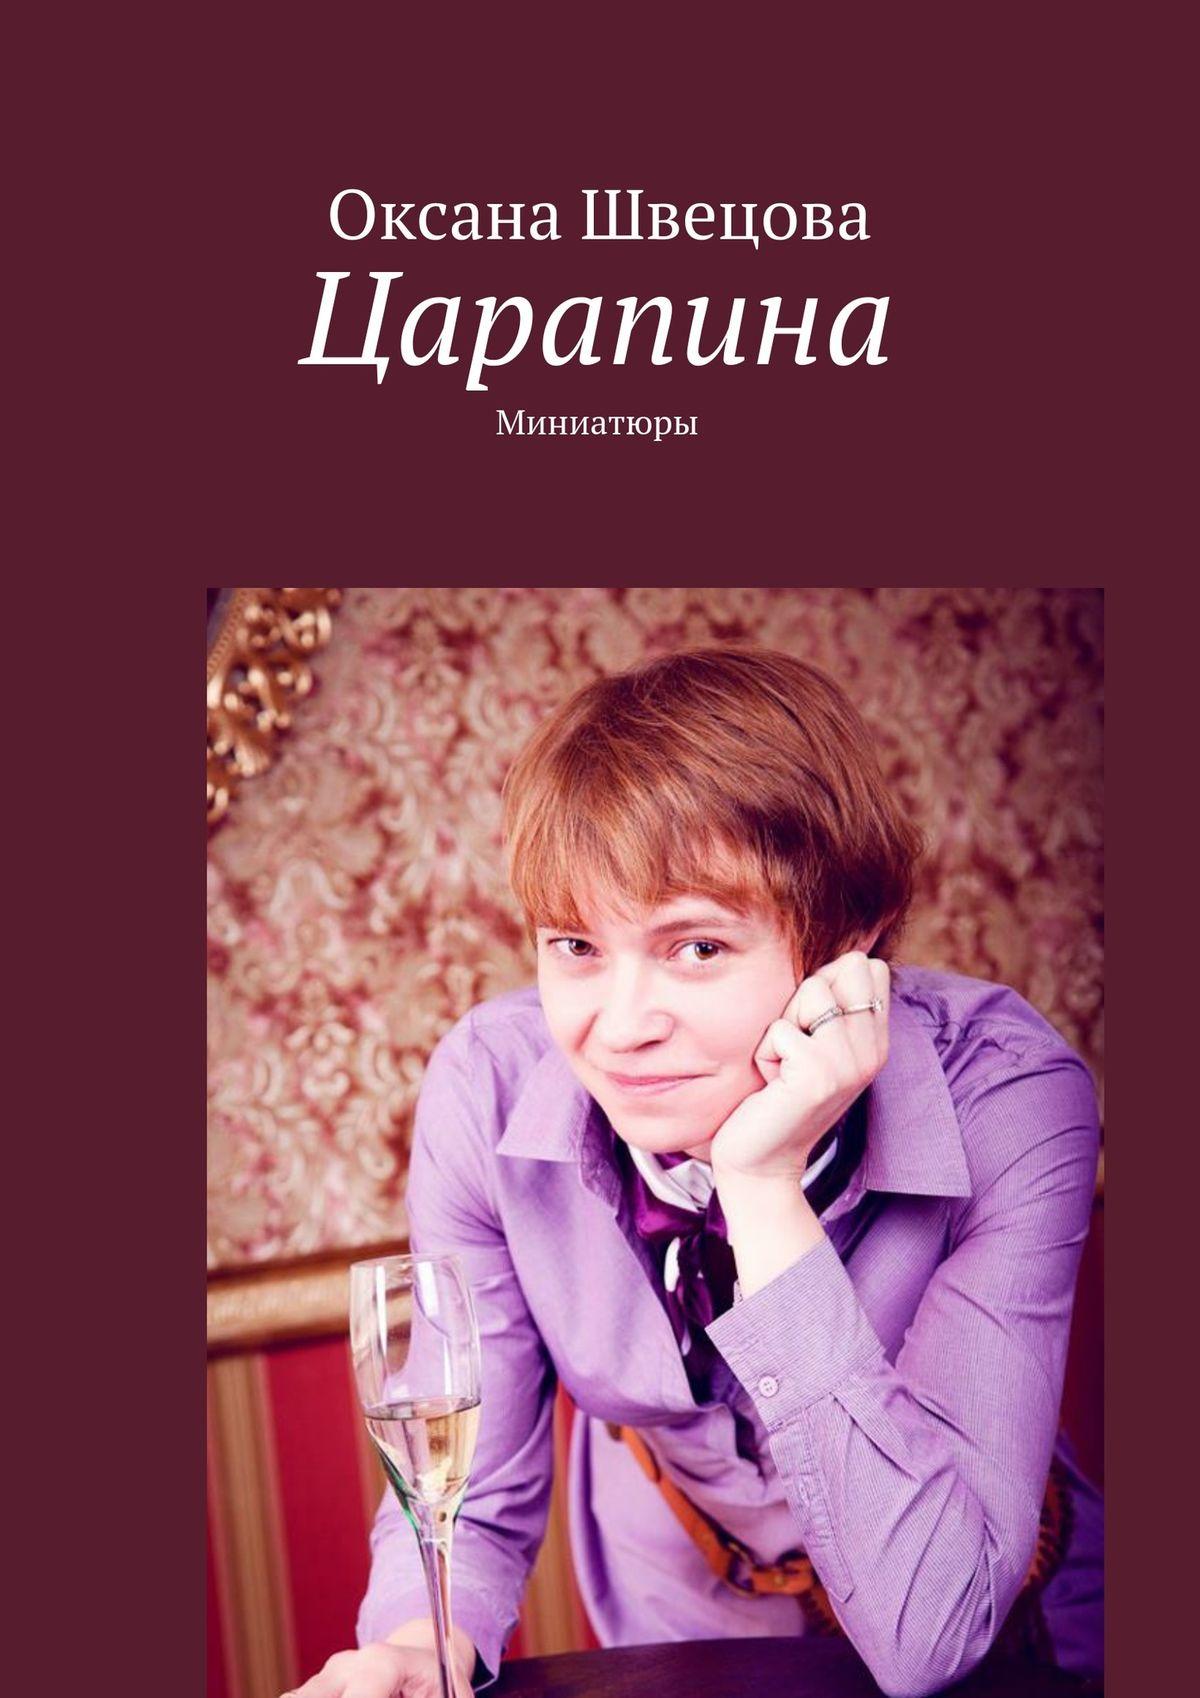 Оксана Швецова Царапина. Миниатюры